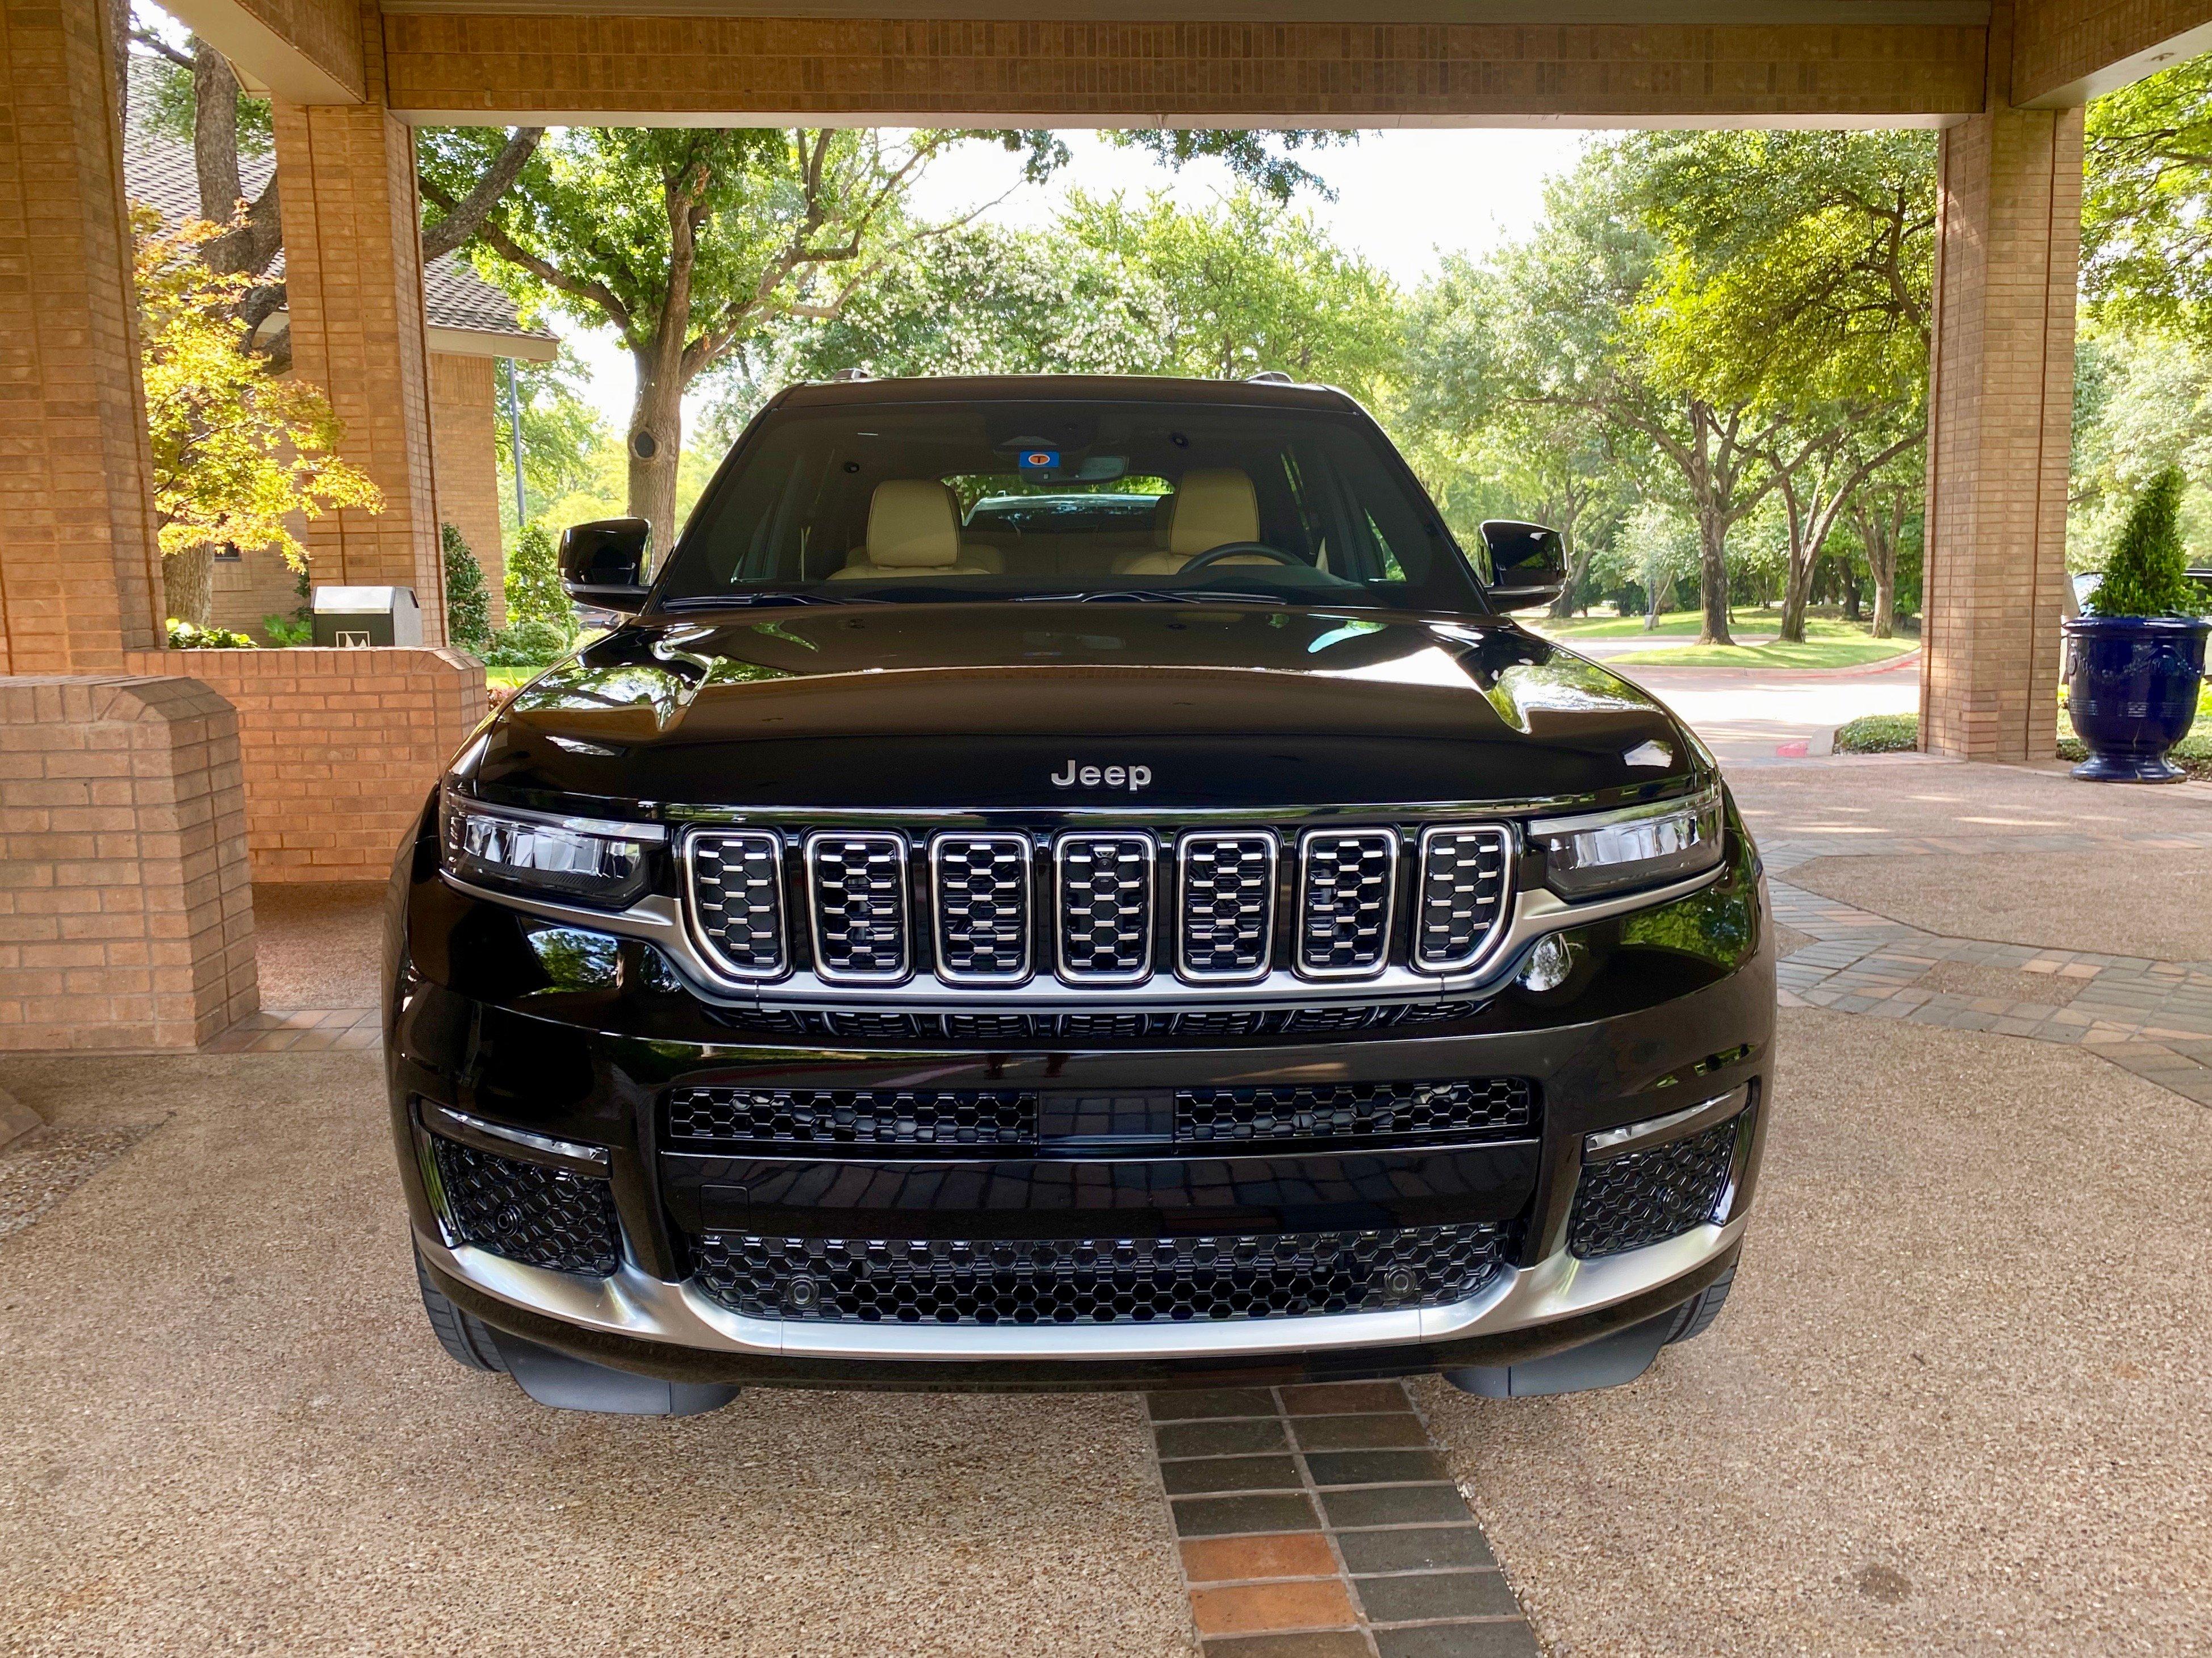 2021-Jeep-Grand-Cherokee-L-grille-carprousa